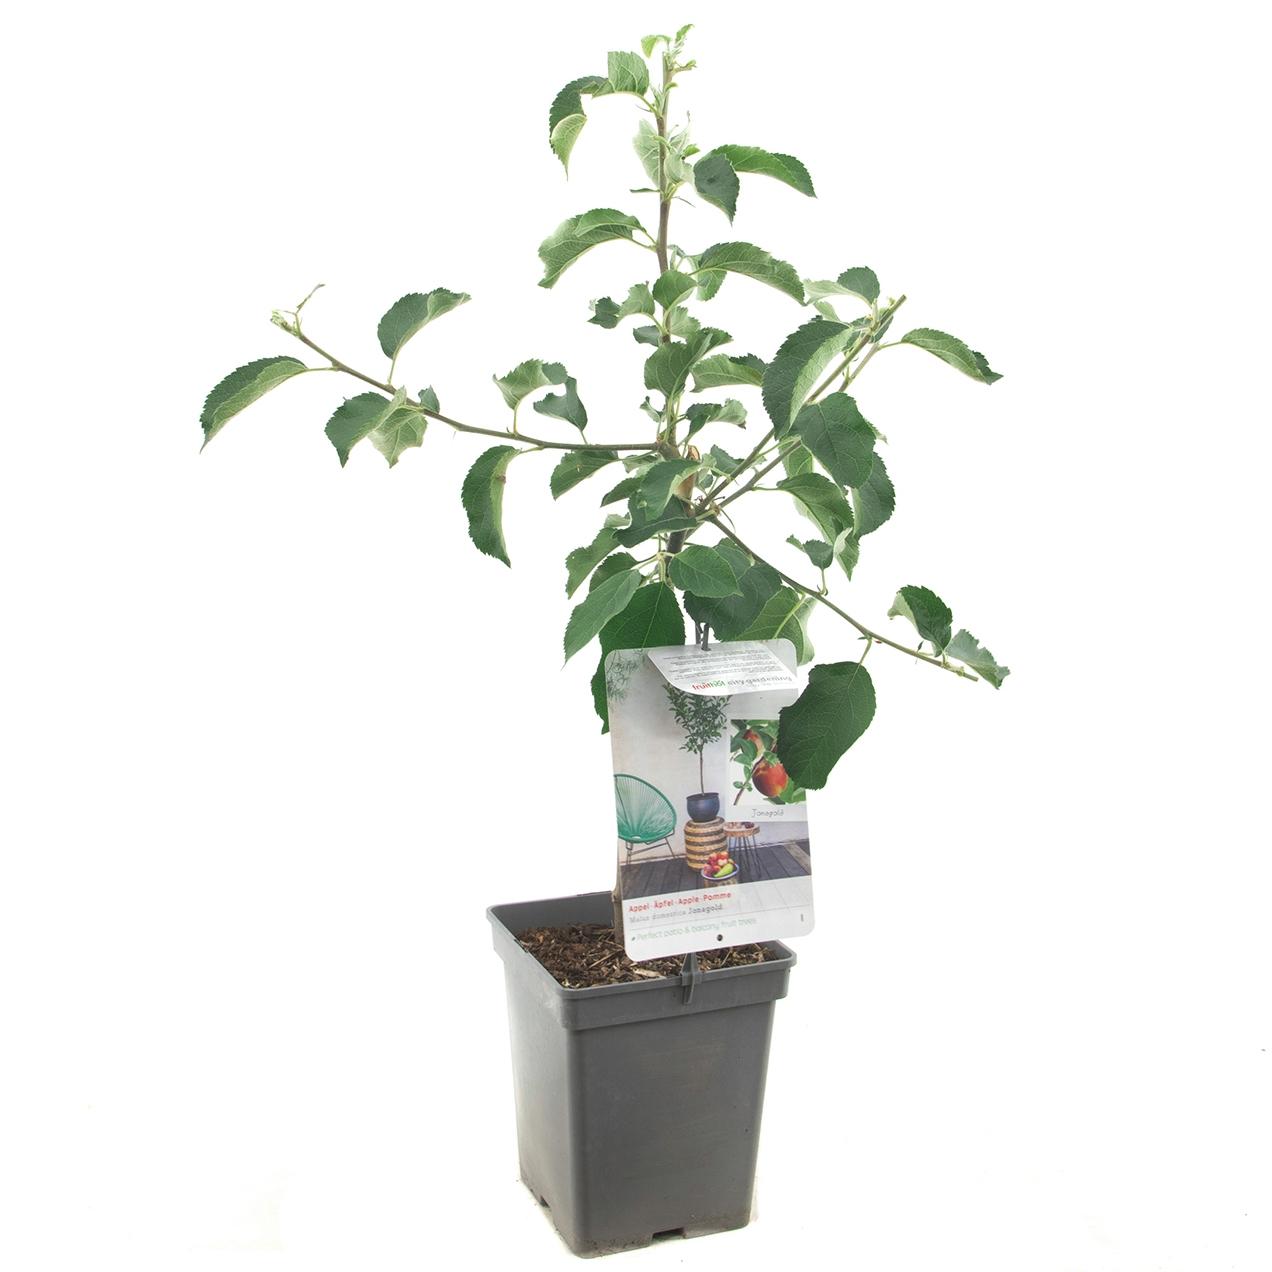 Patio appelboom Malus domestica 'Jonagold'